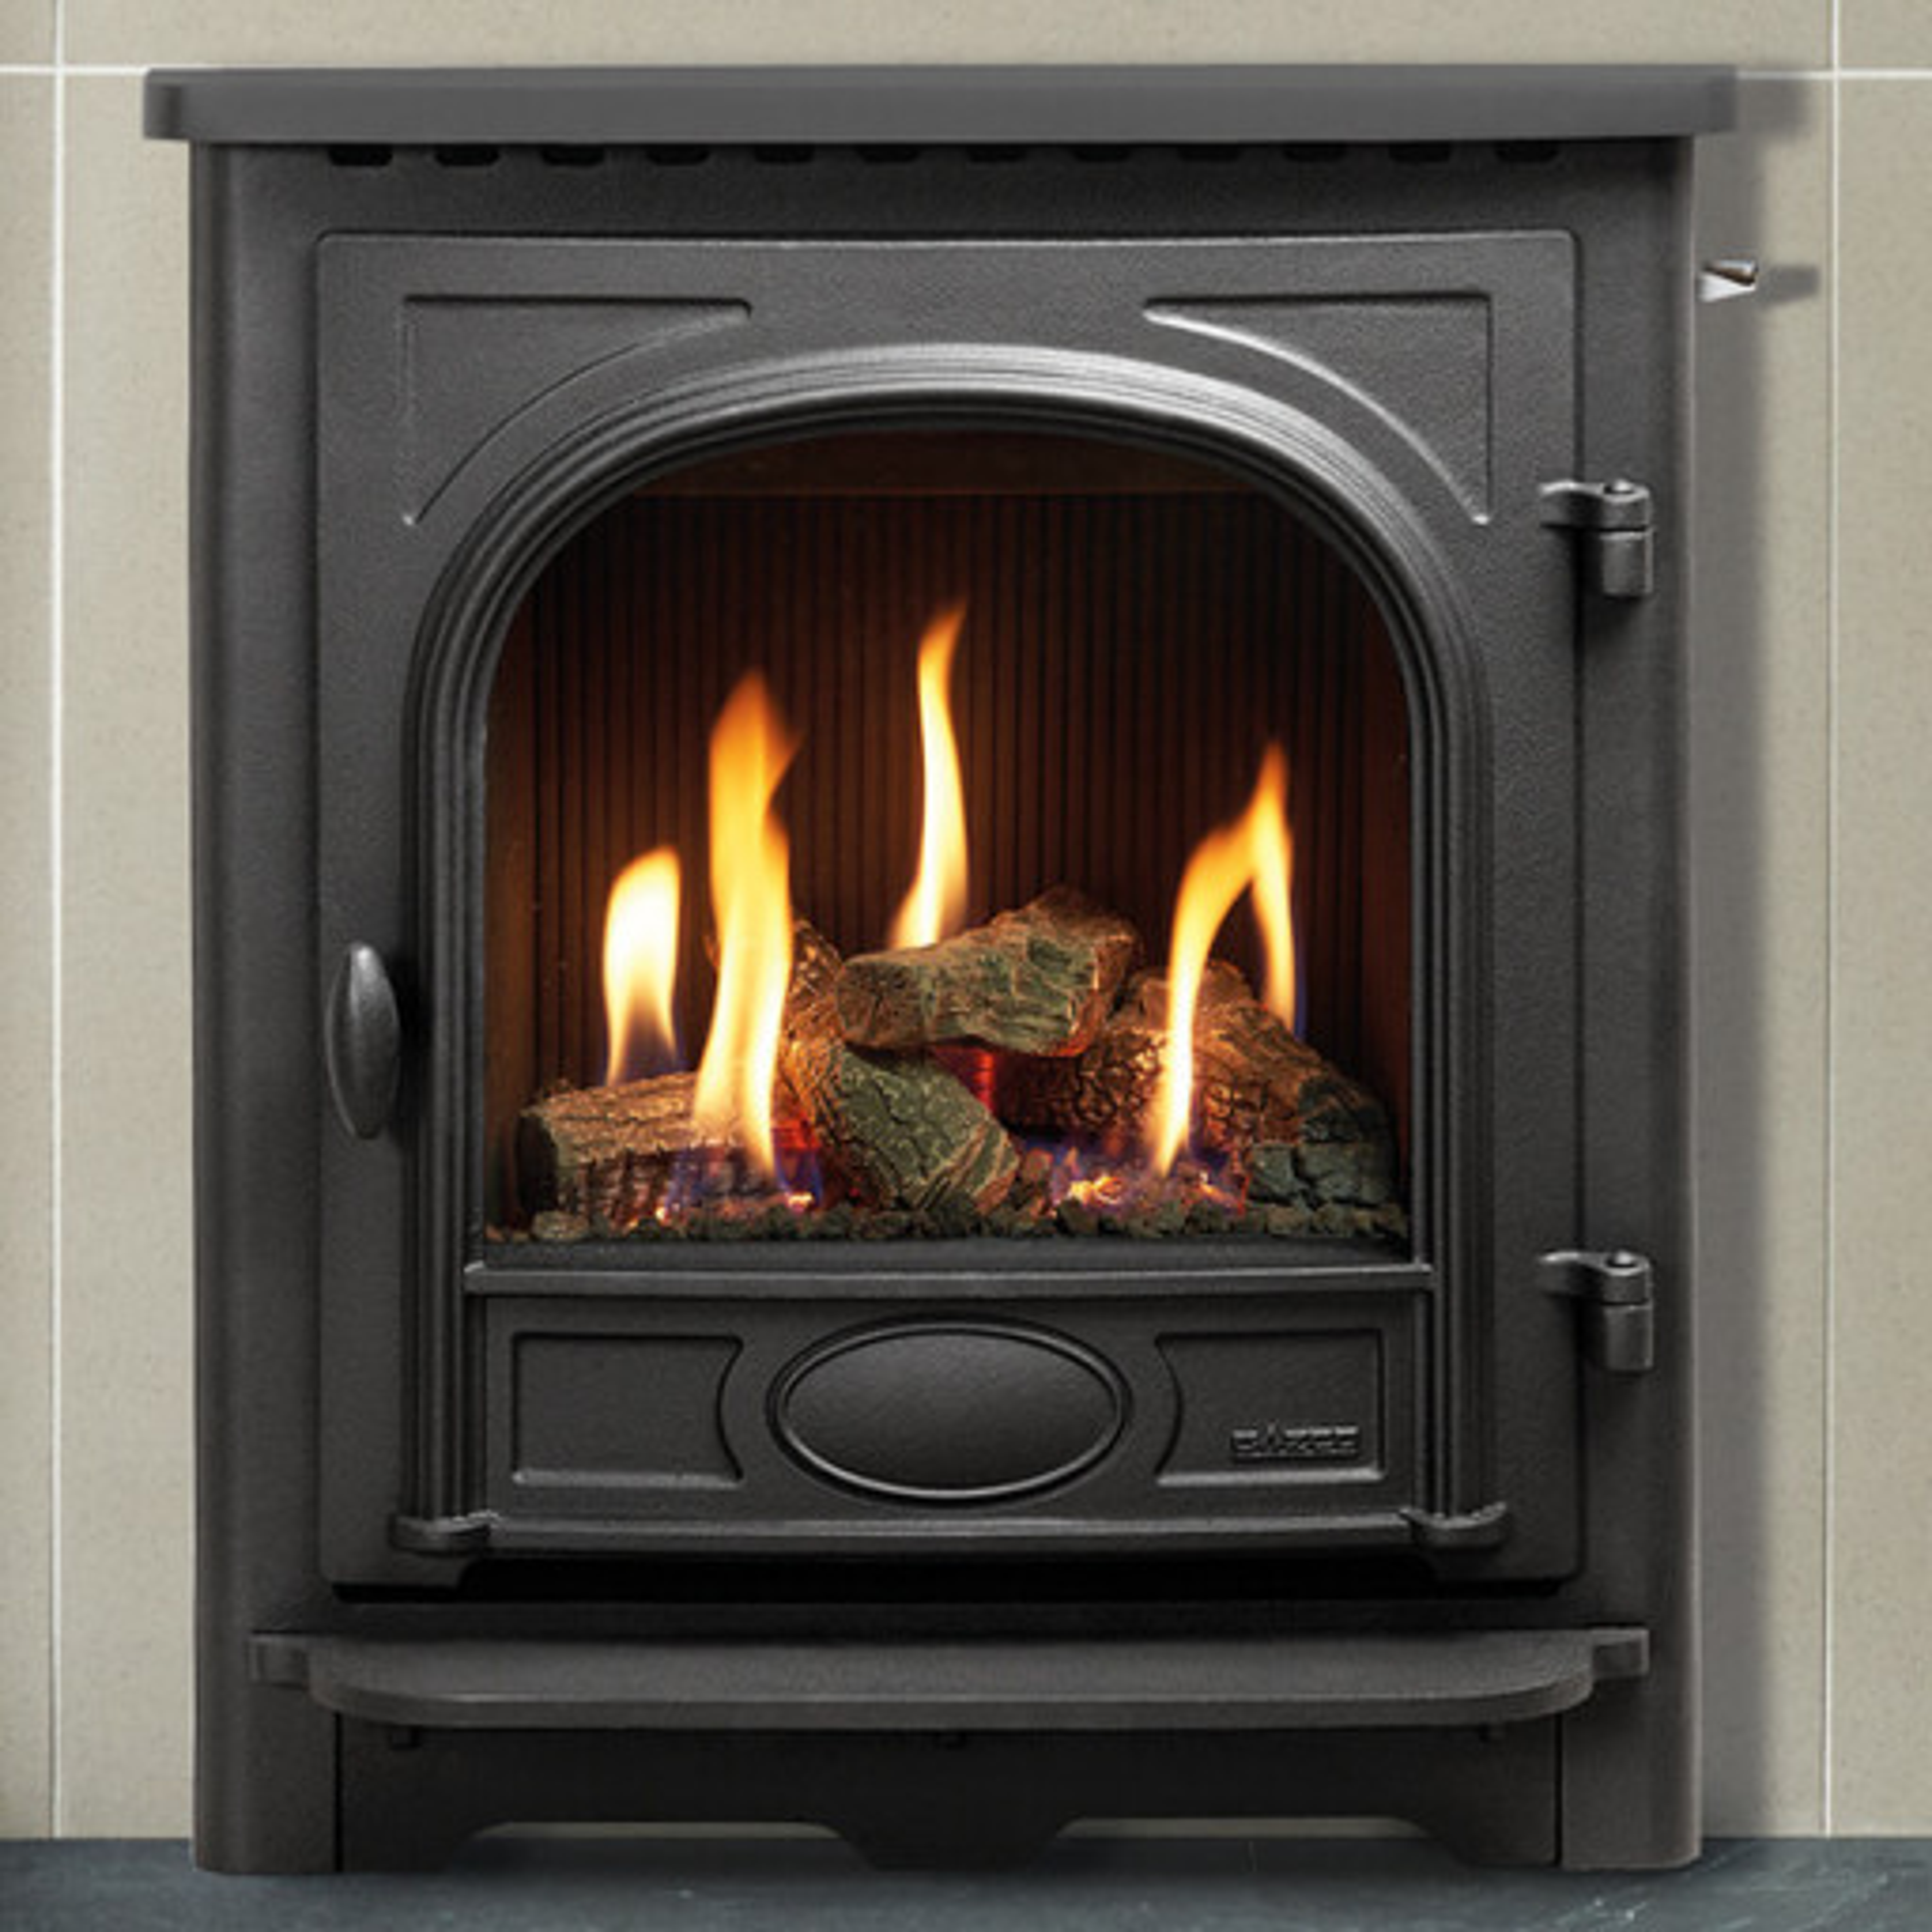 Logic HE Stockton Log Effect gas fire (Balanced Flue)